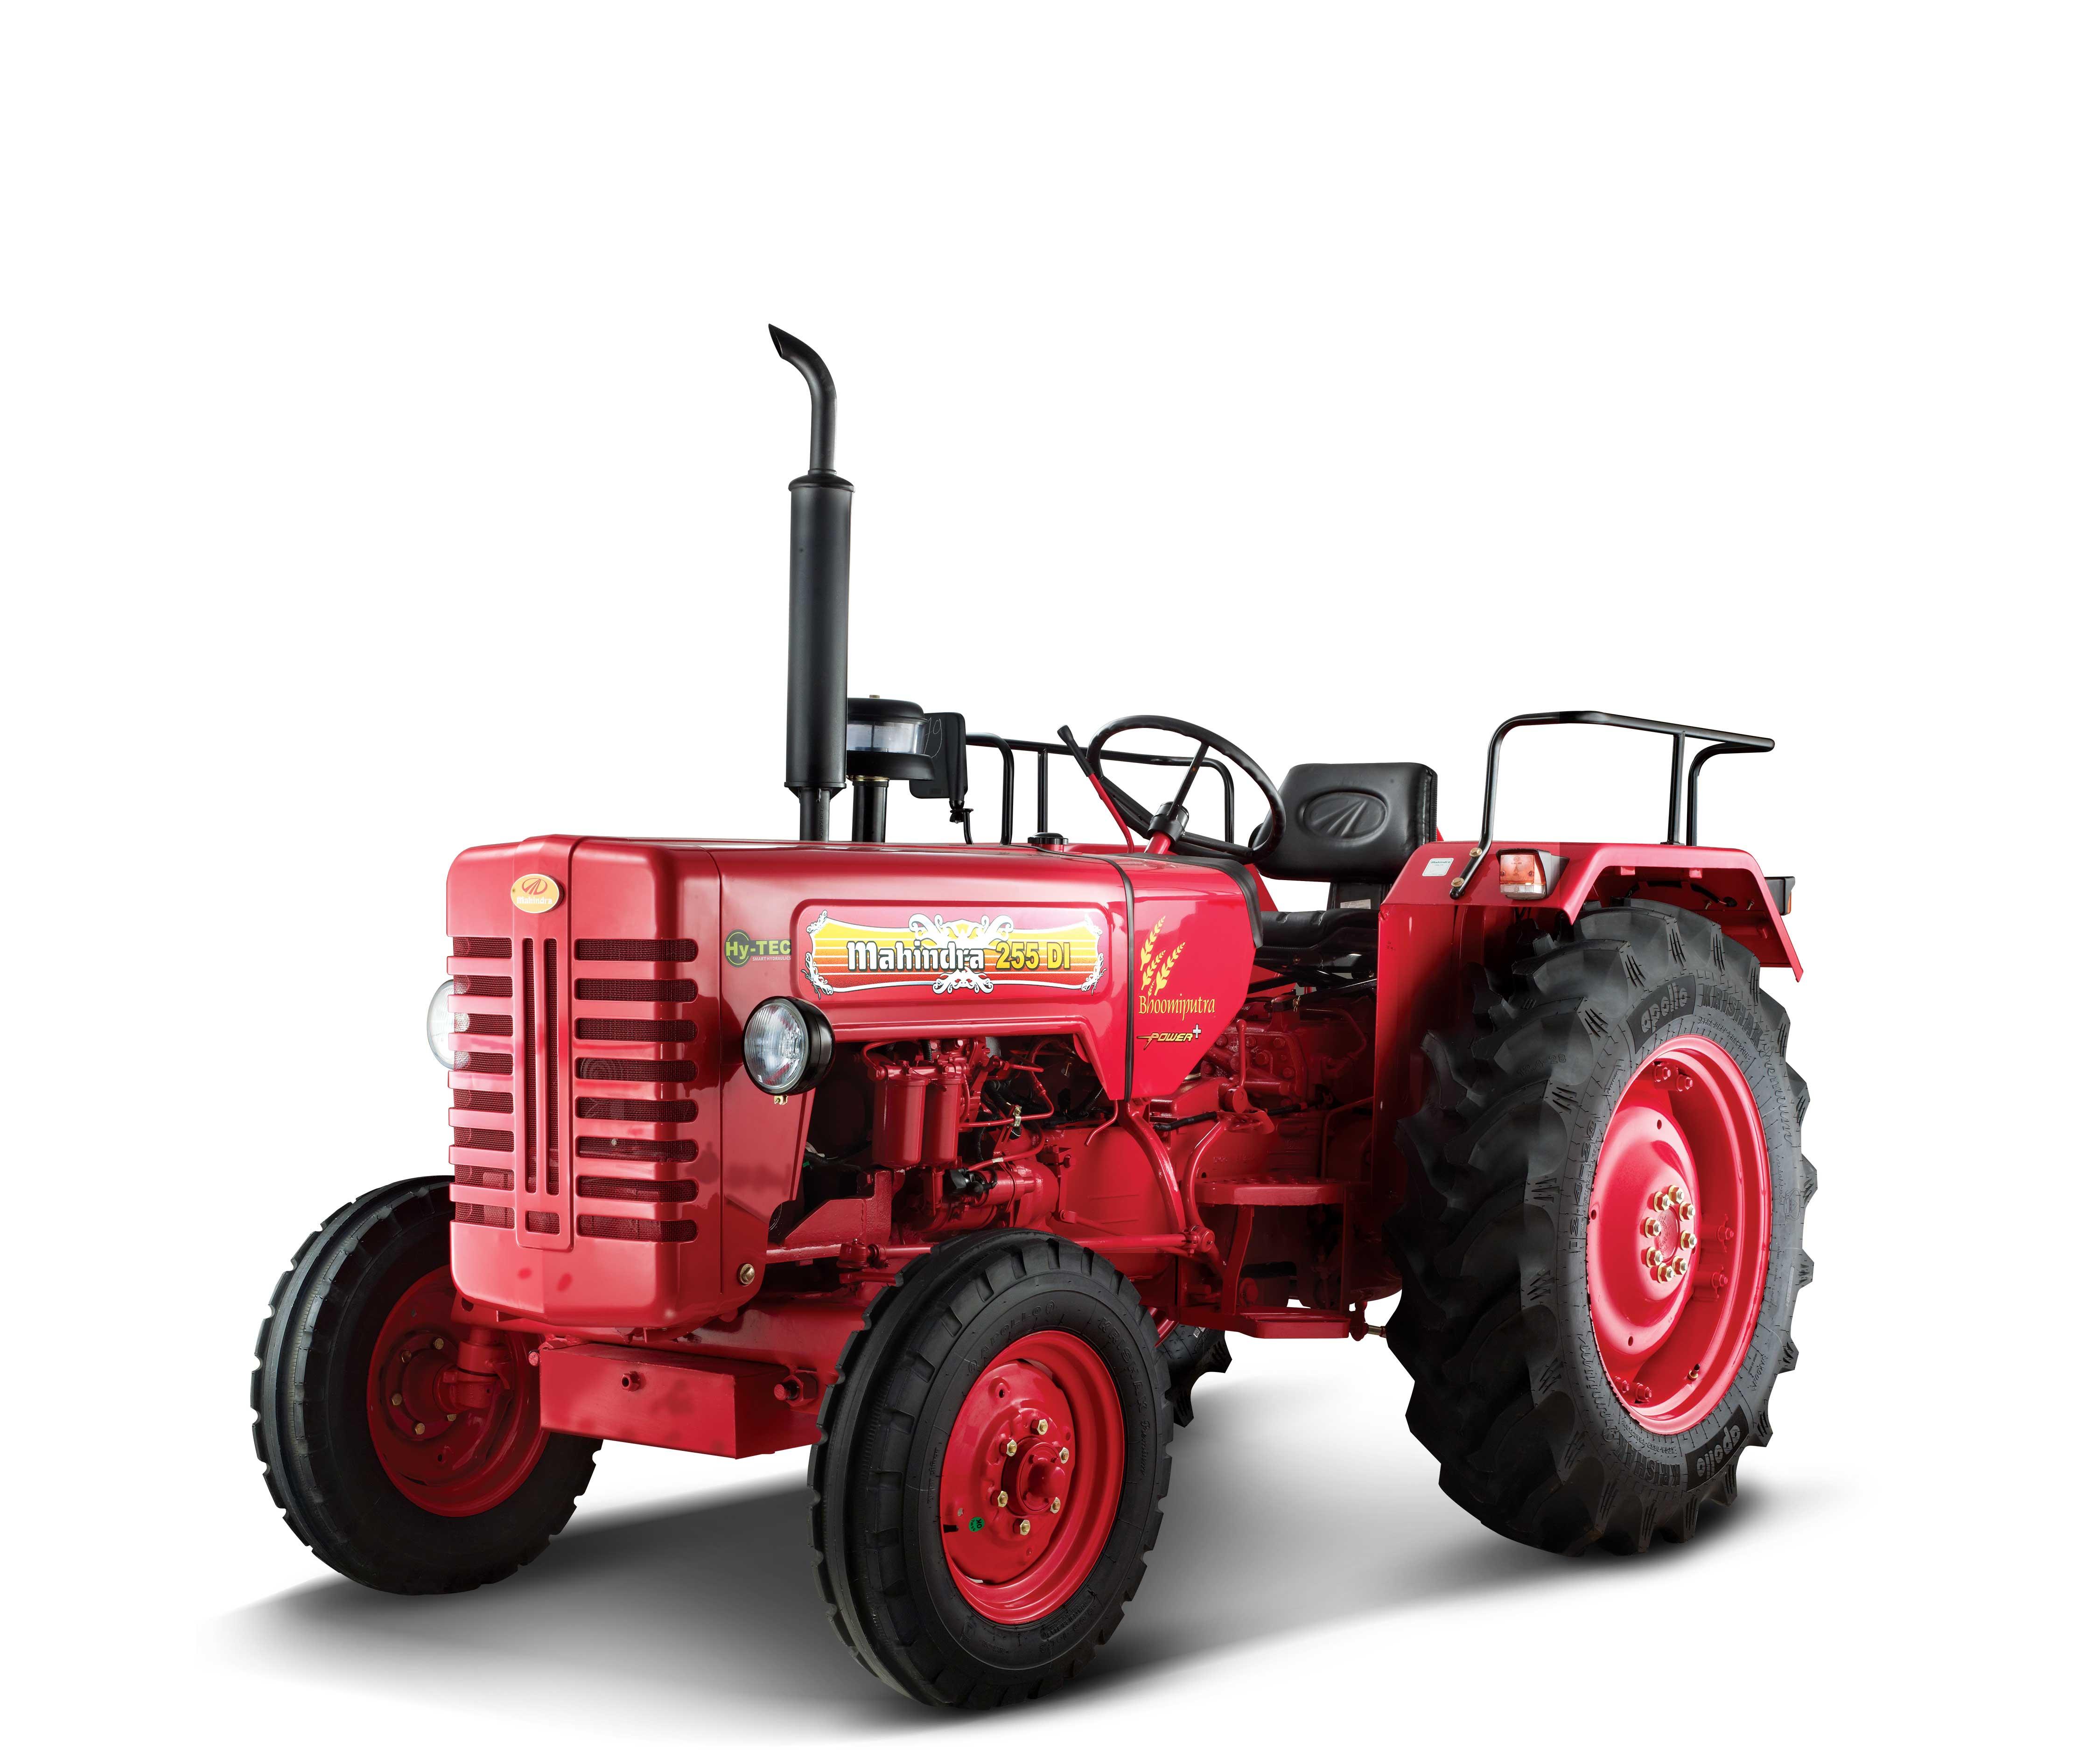 Mahindra Tractors launches the new Mahindra 255 DI PowerPlus.